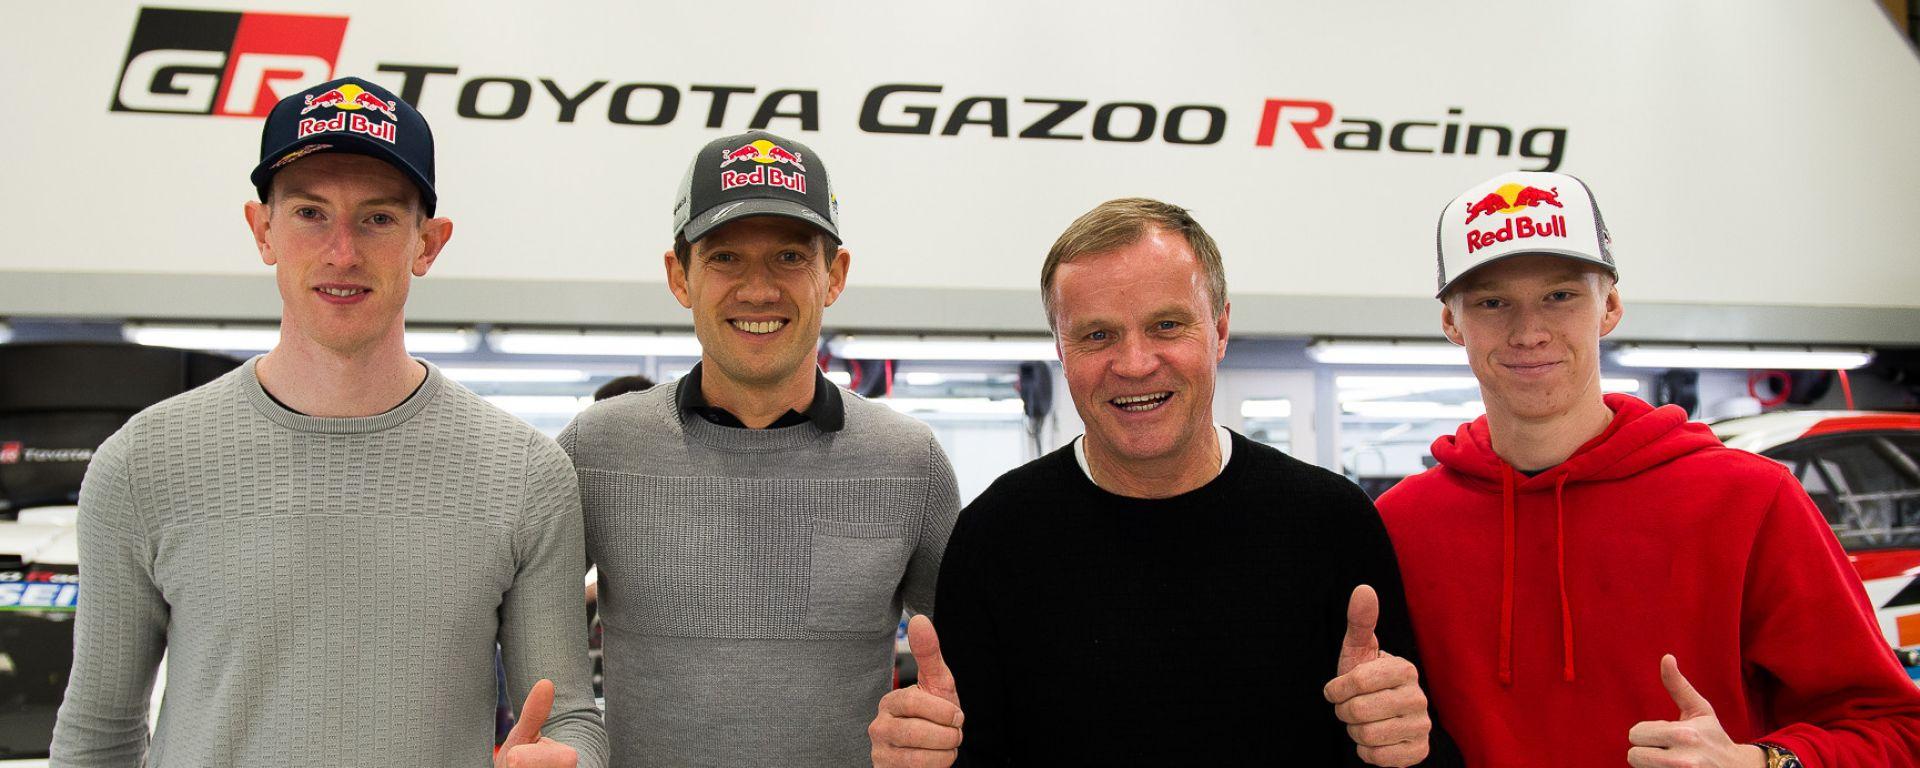 WRC, la line-up Toyota 2020: (da sinistra) Evans, Ogier, il team principal Makinen e Rovanpera